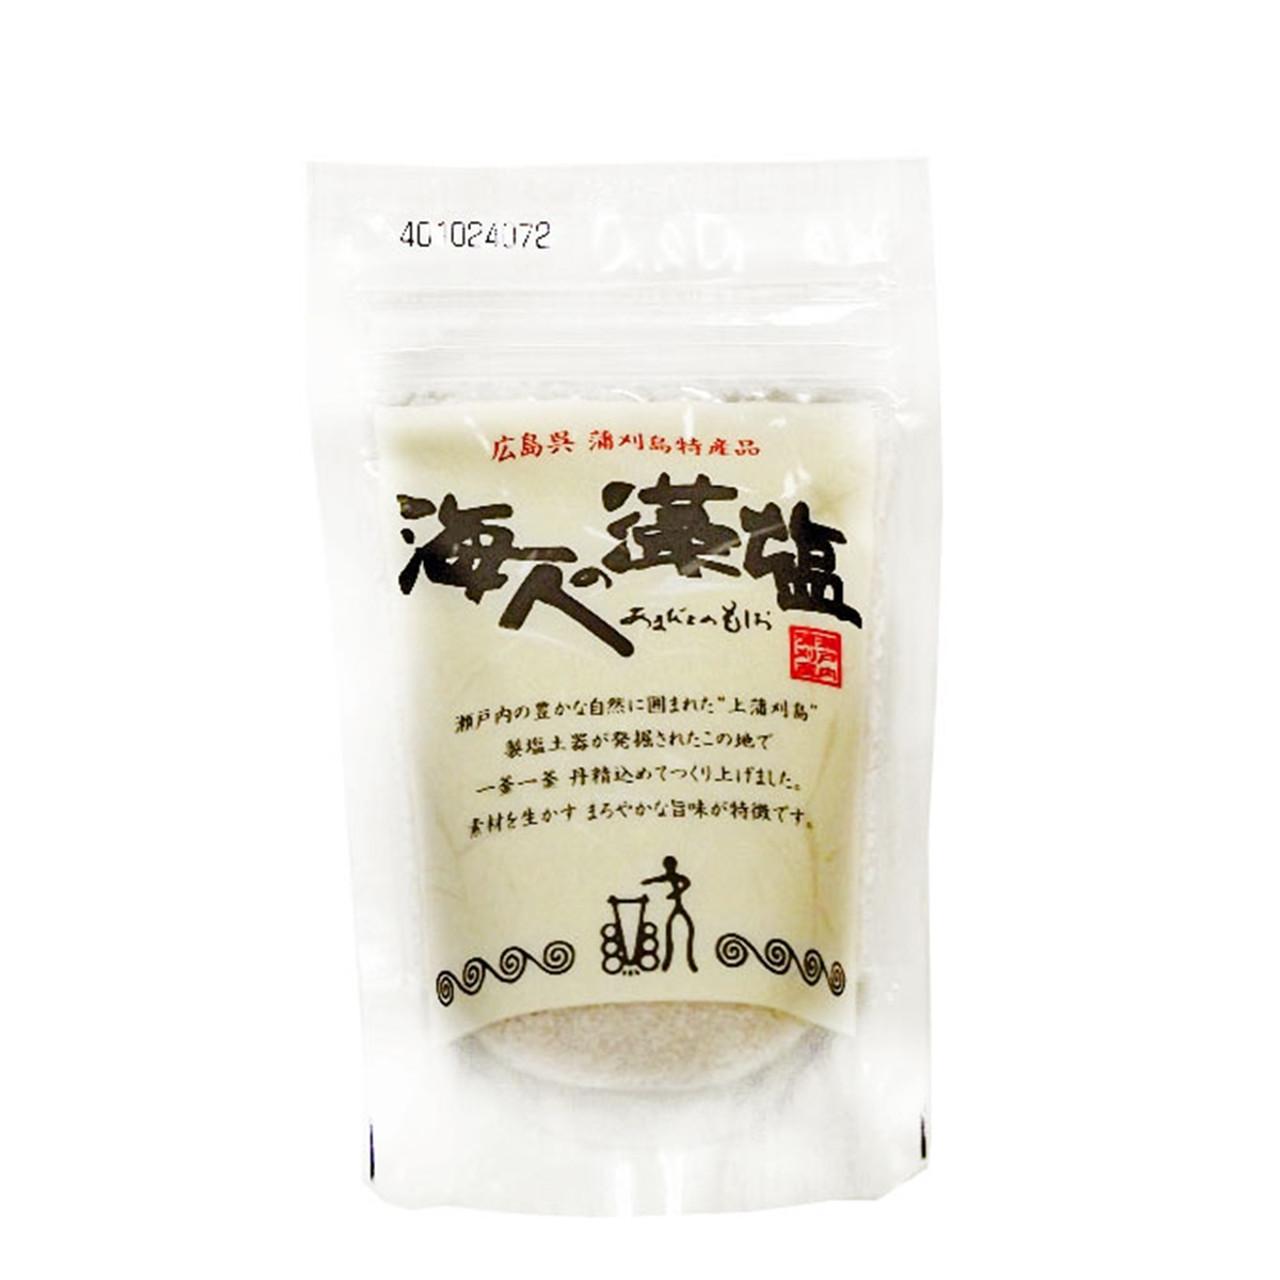 Amabito-no Moshio - Japanese Seaweed Sea Salt